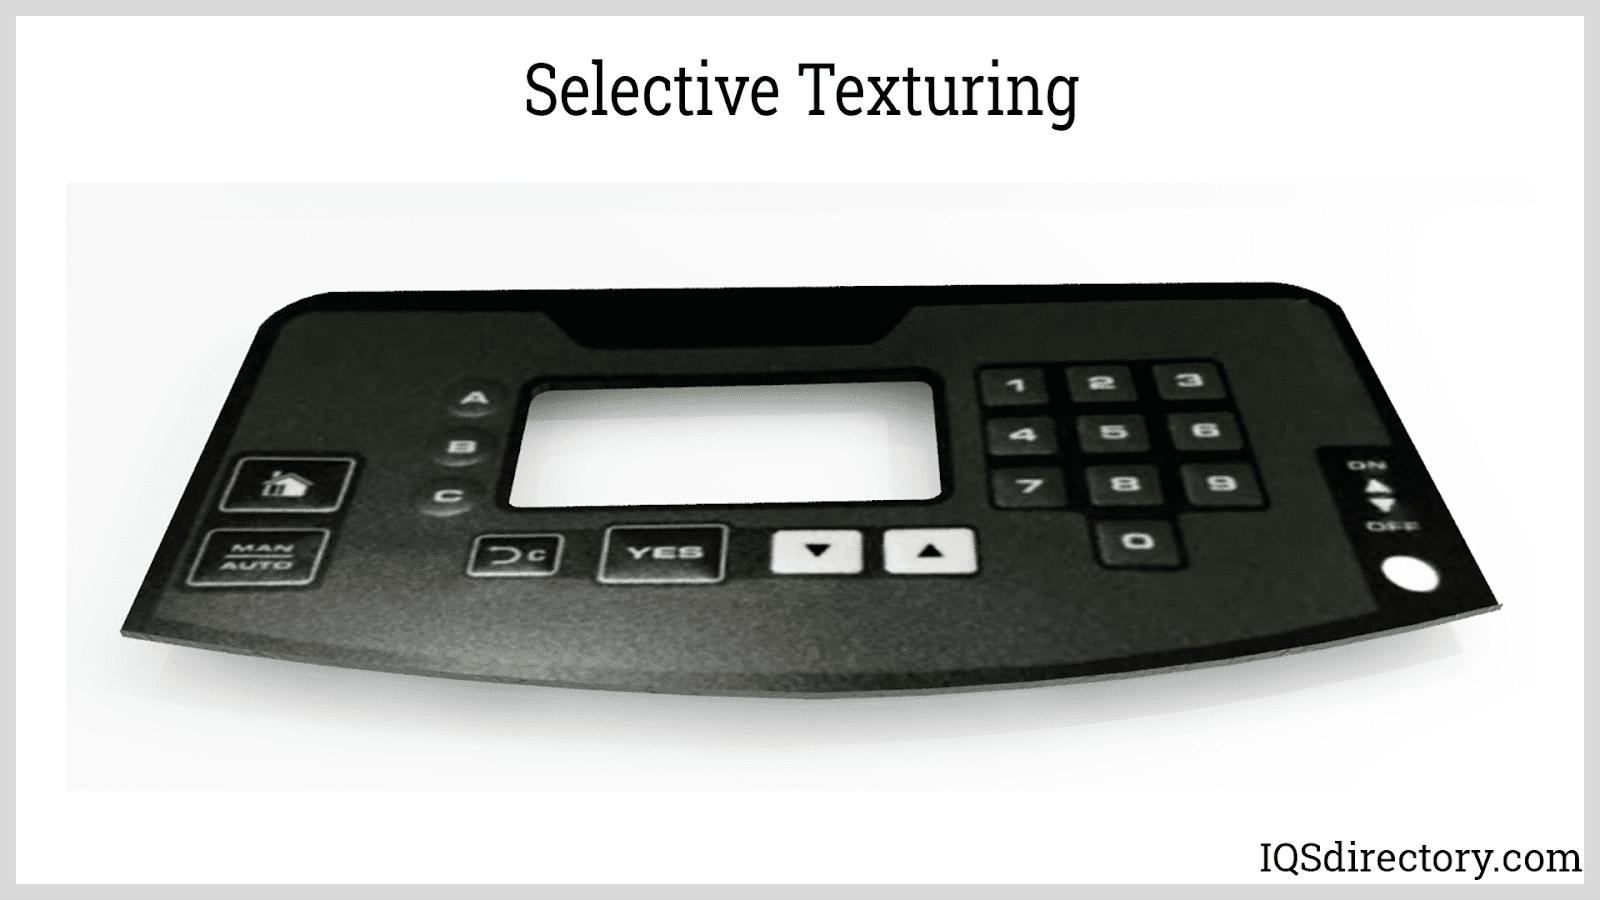 Selective Texturing